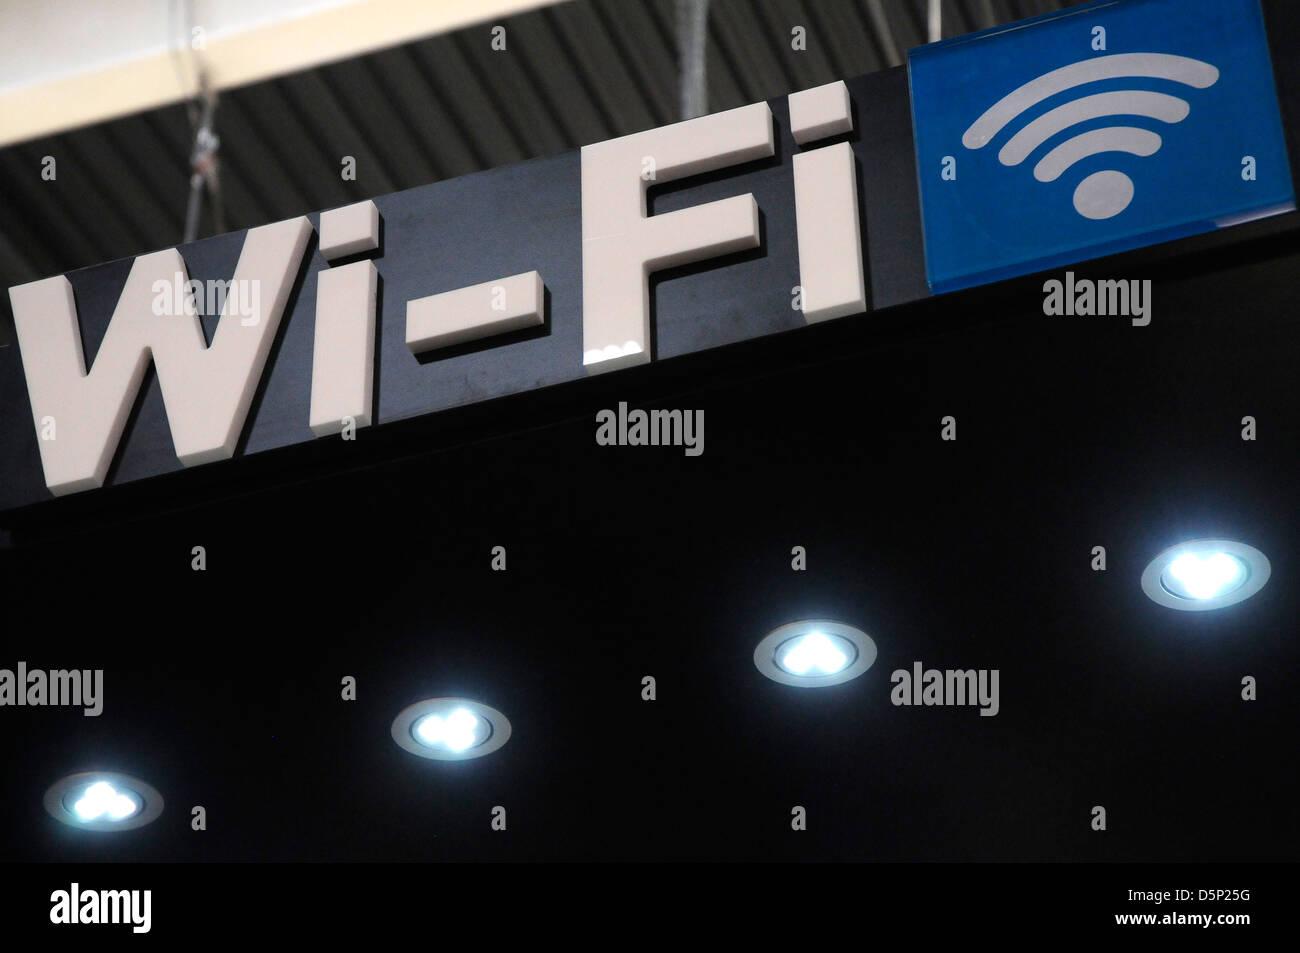 Une connexion Wi-Fi gratuite, connexion World Mobile Congress à Barcelone. Photo Stock